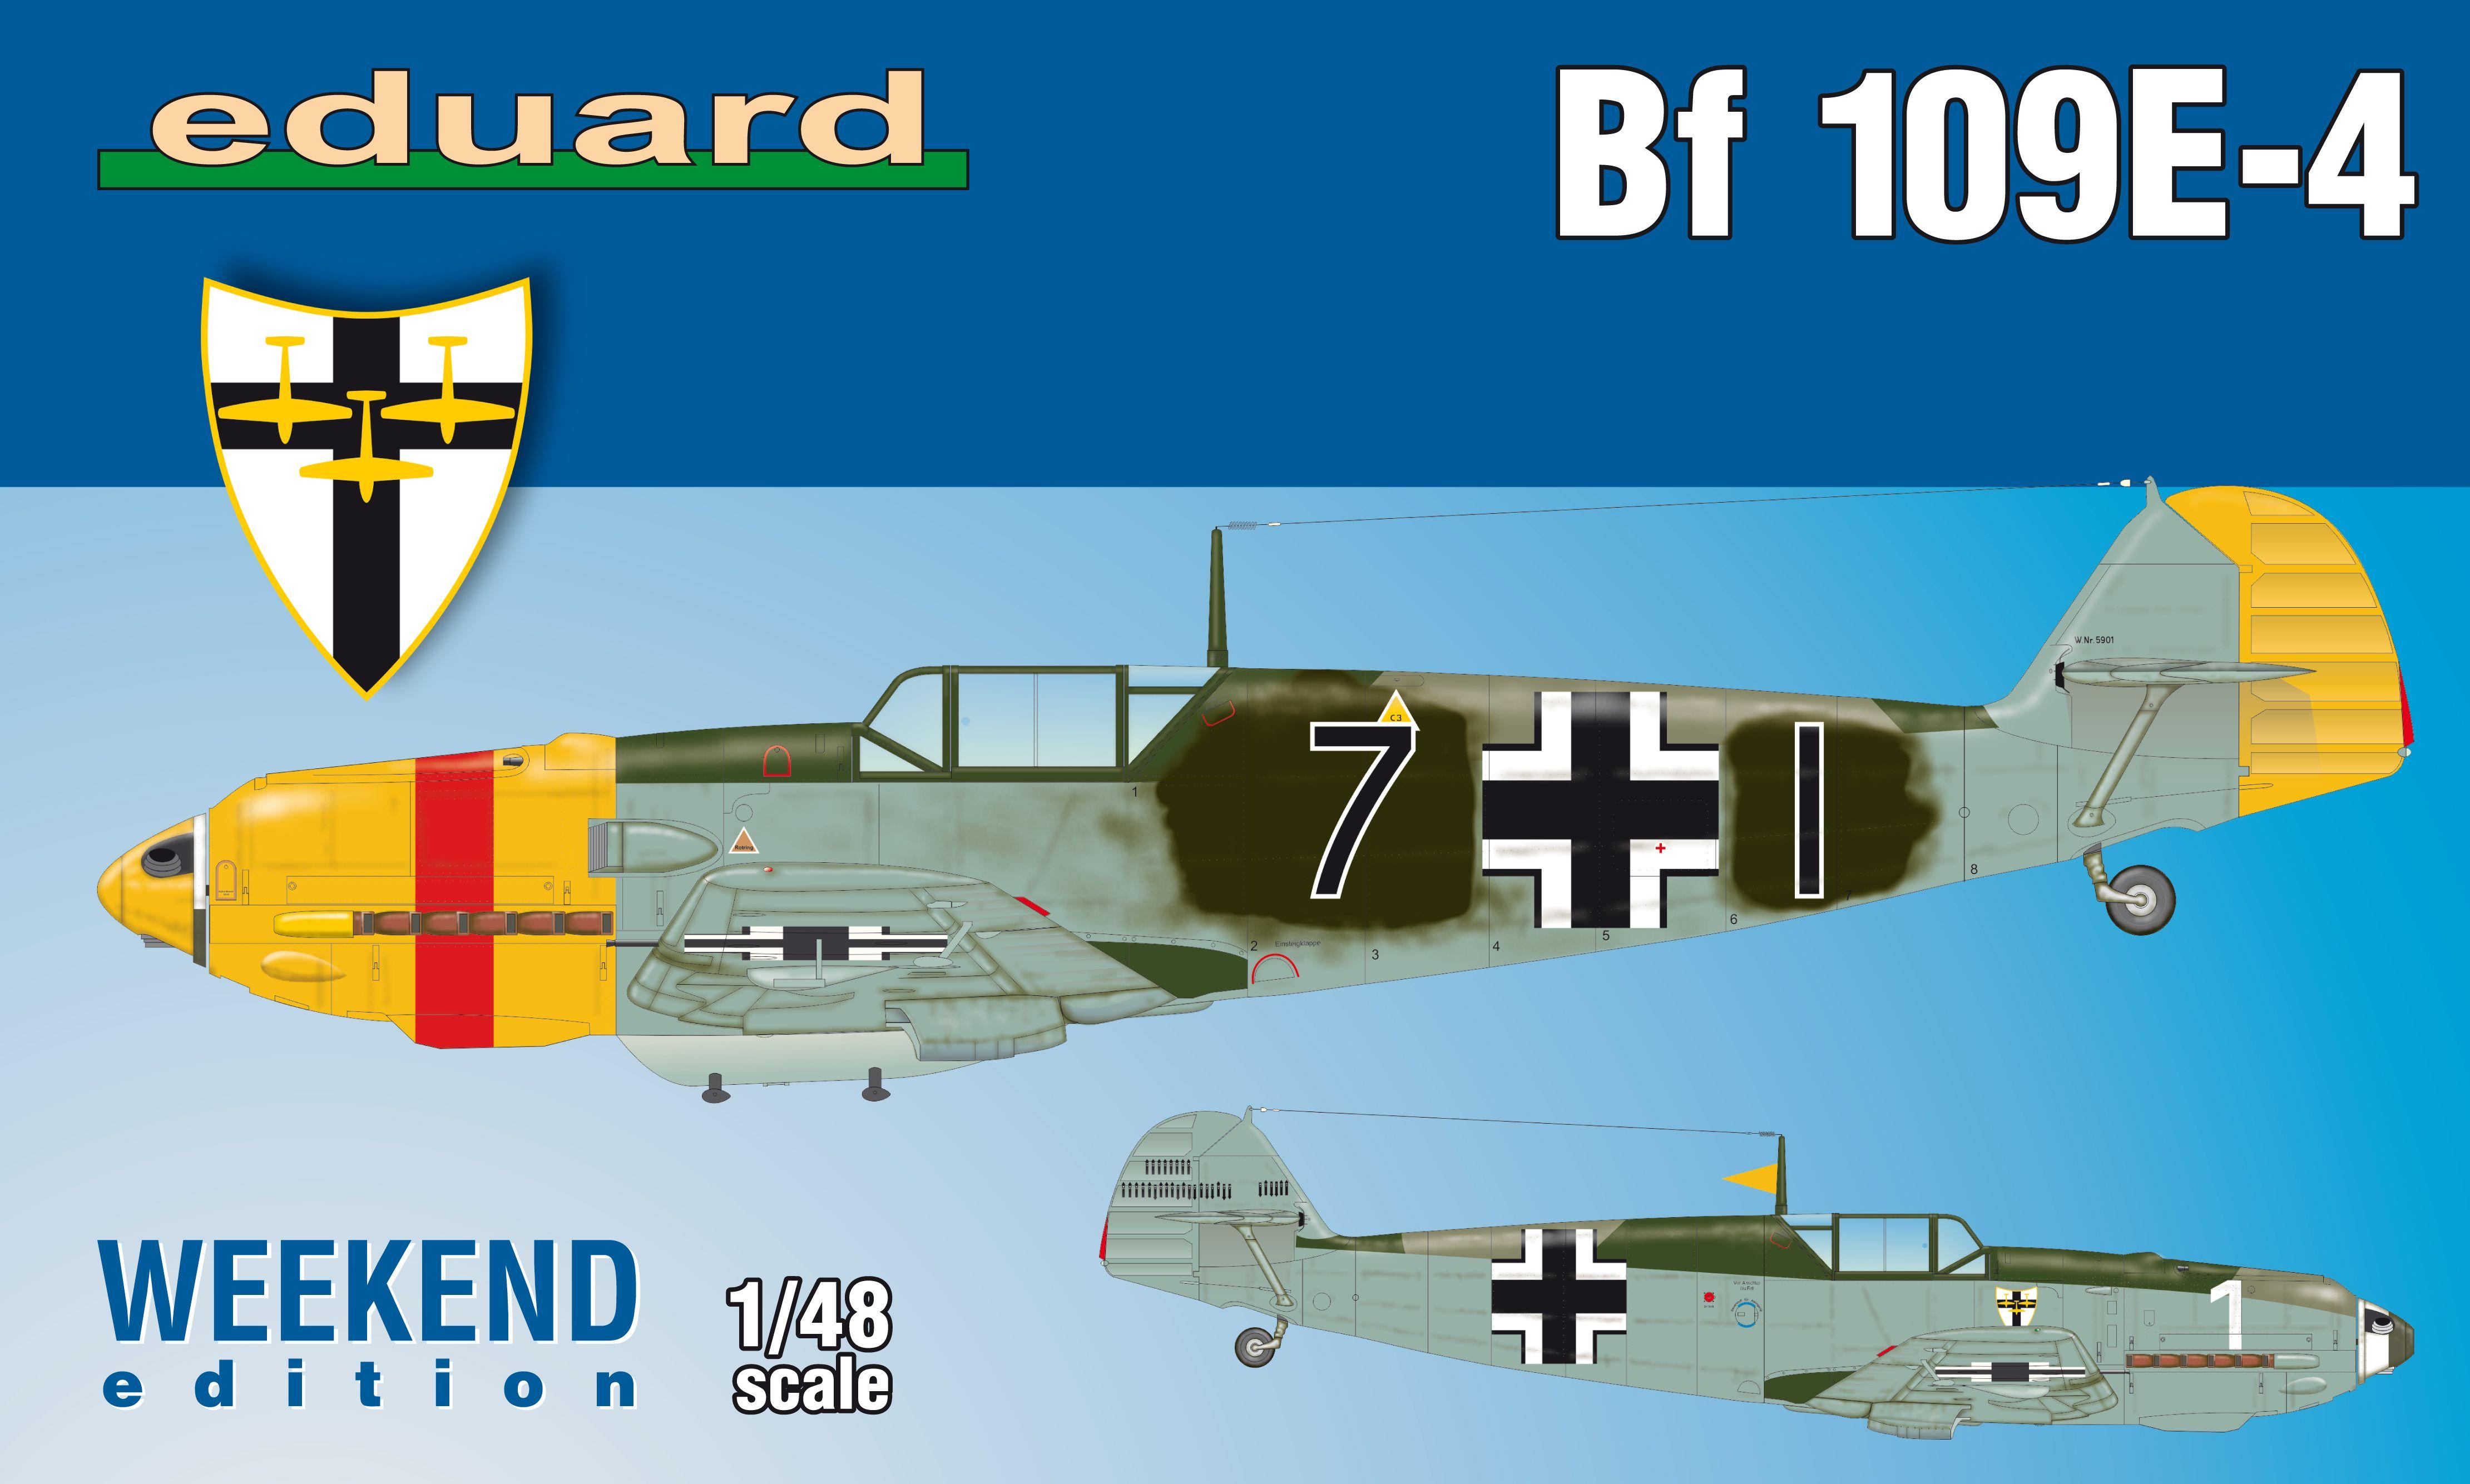 1:24 Luftwaffe WWII Seatbelts Model Kit Eduard 124 Air Force Etched Parts Set